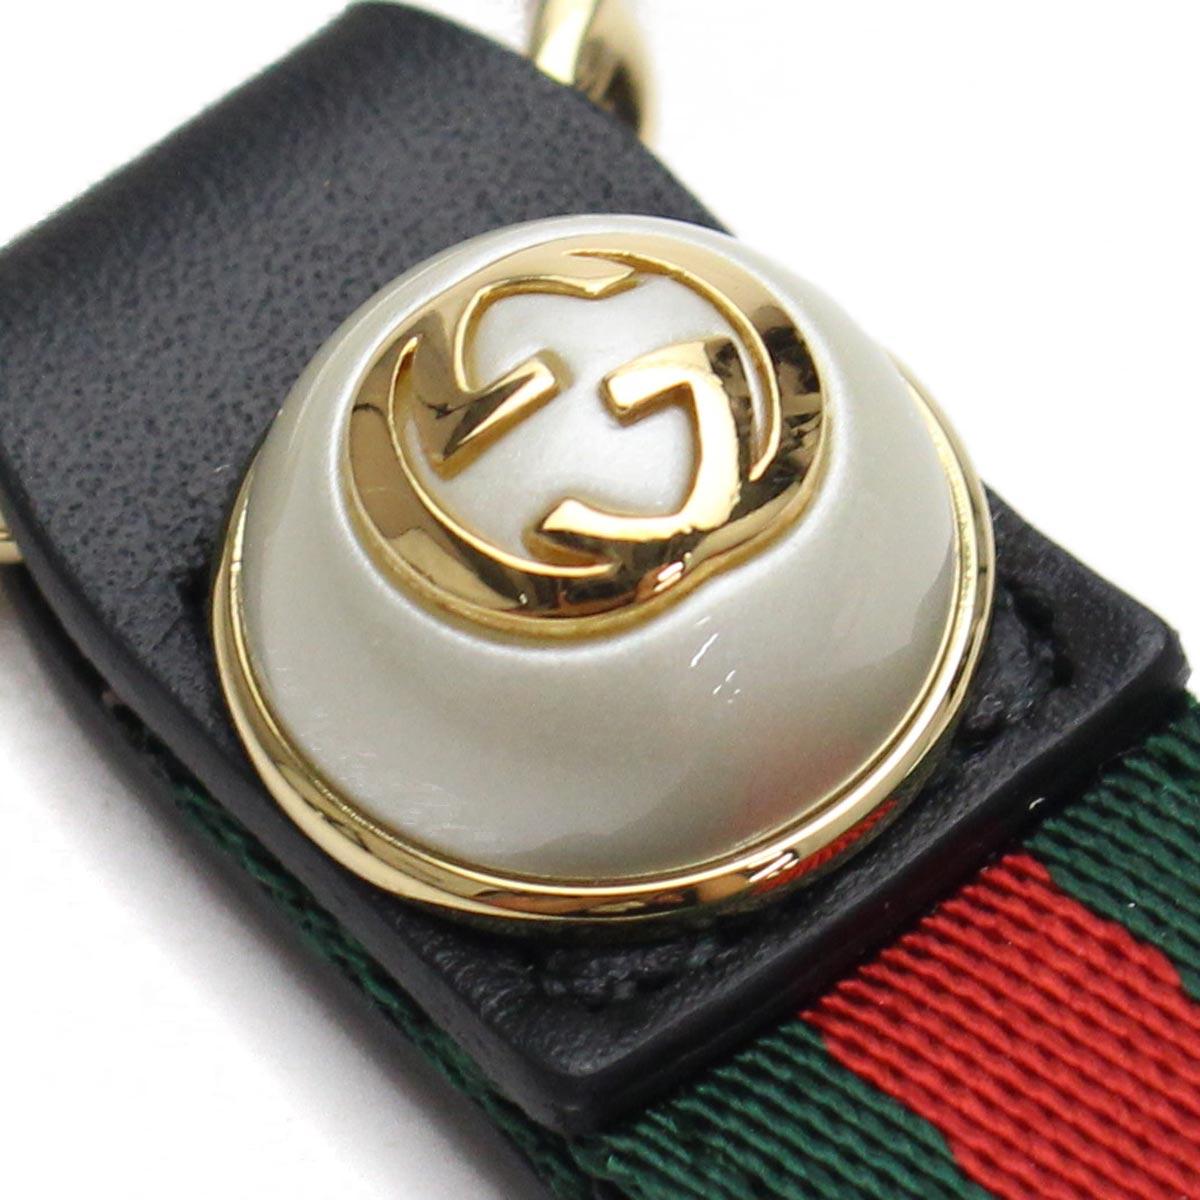 94ae80dbb79 Bighit The total brand wholesale  Gucci (GUCCI) GG pearl Web key ...